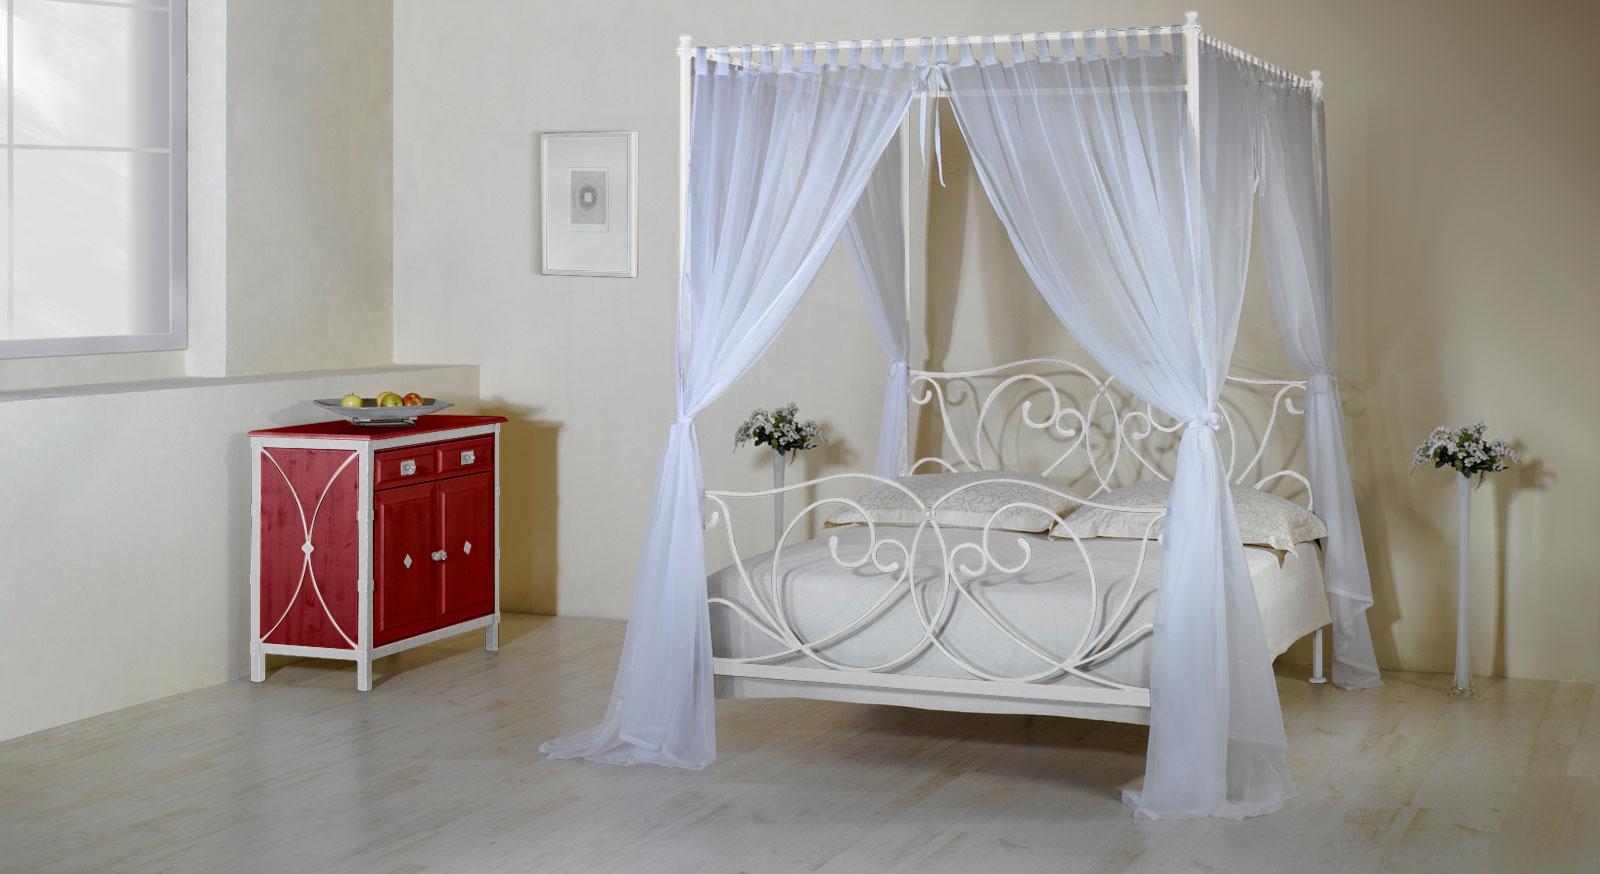 Romantisches himmelbett holz  Metall-Himmelbett z.B. in 140x200 cm weiß - Vila Nova